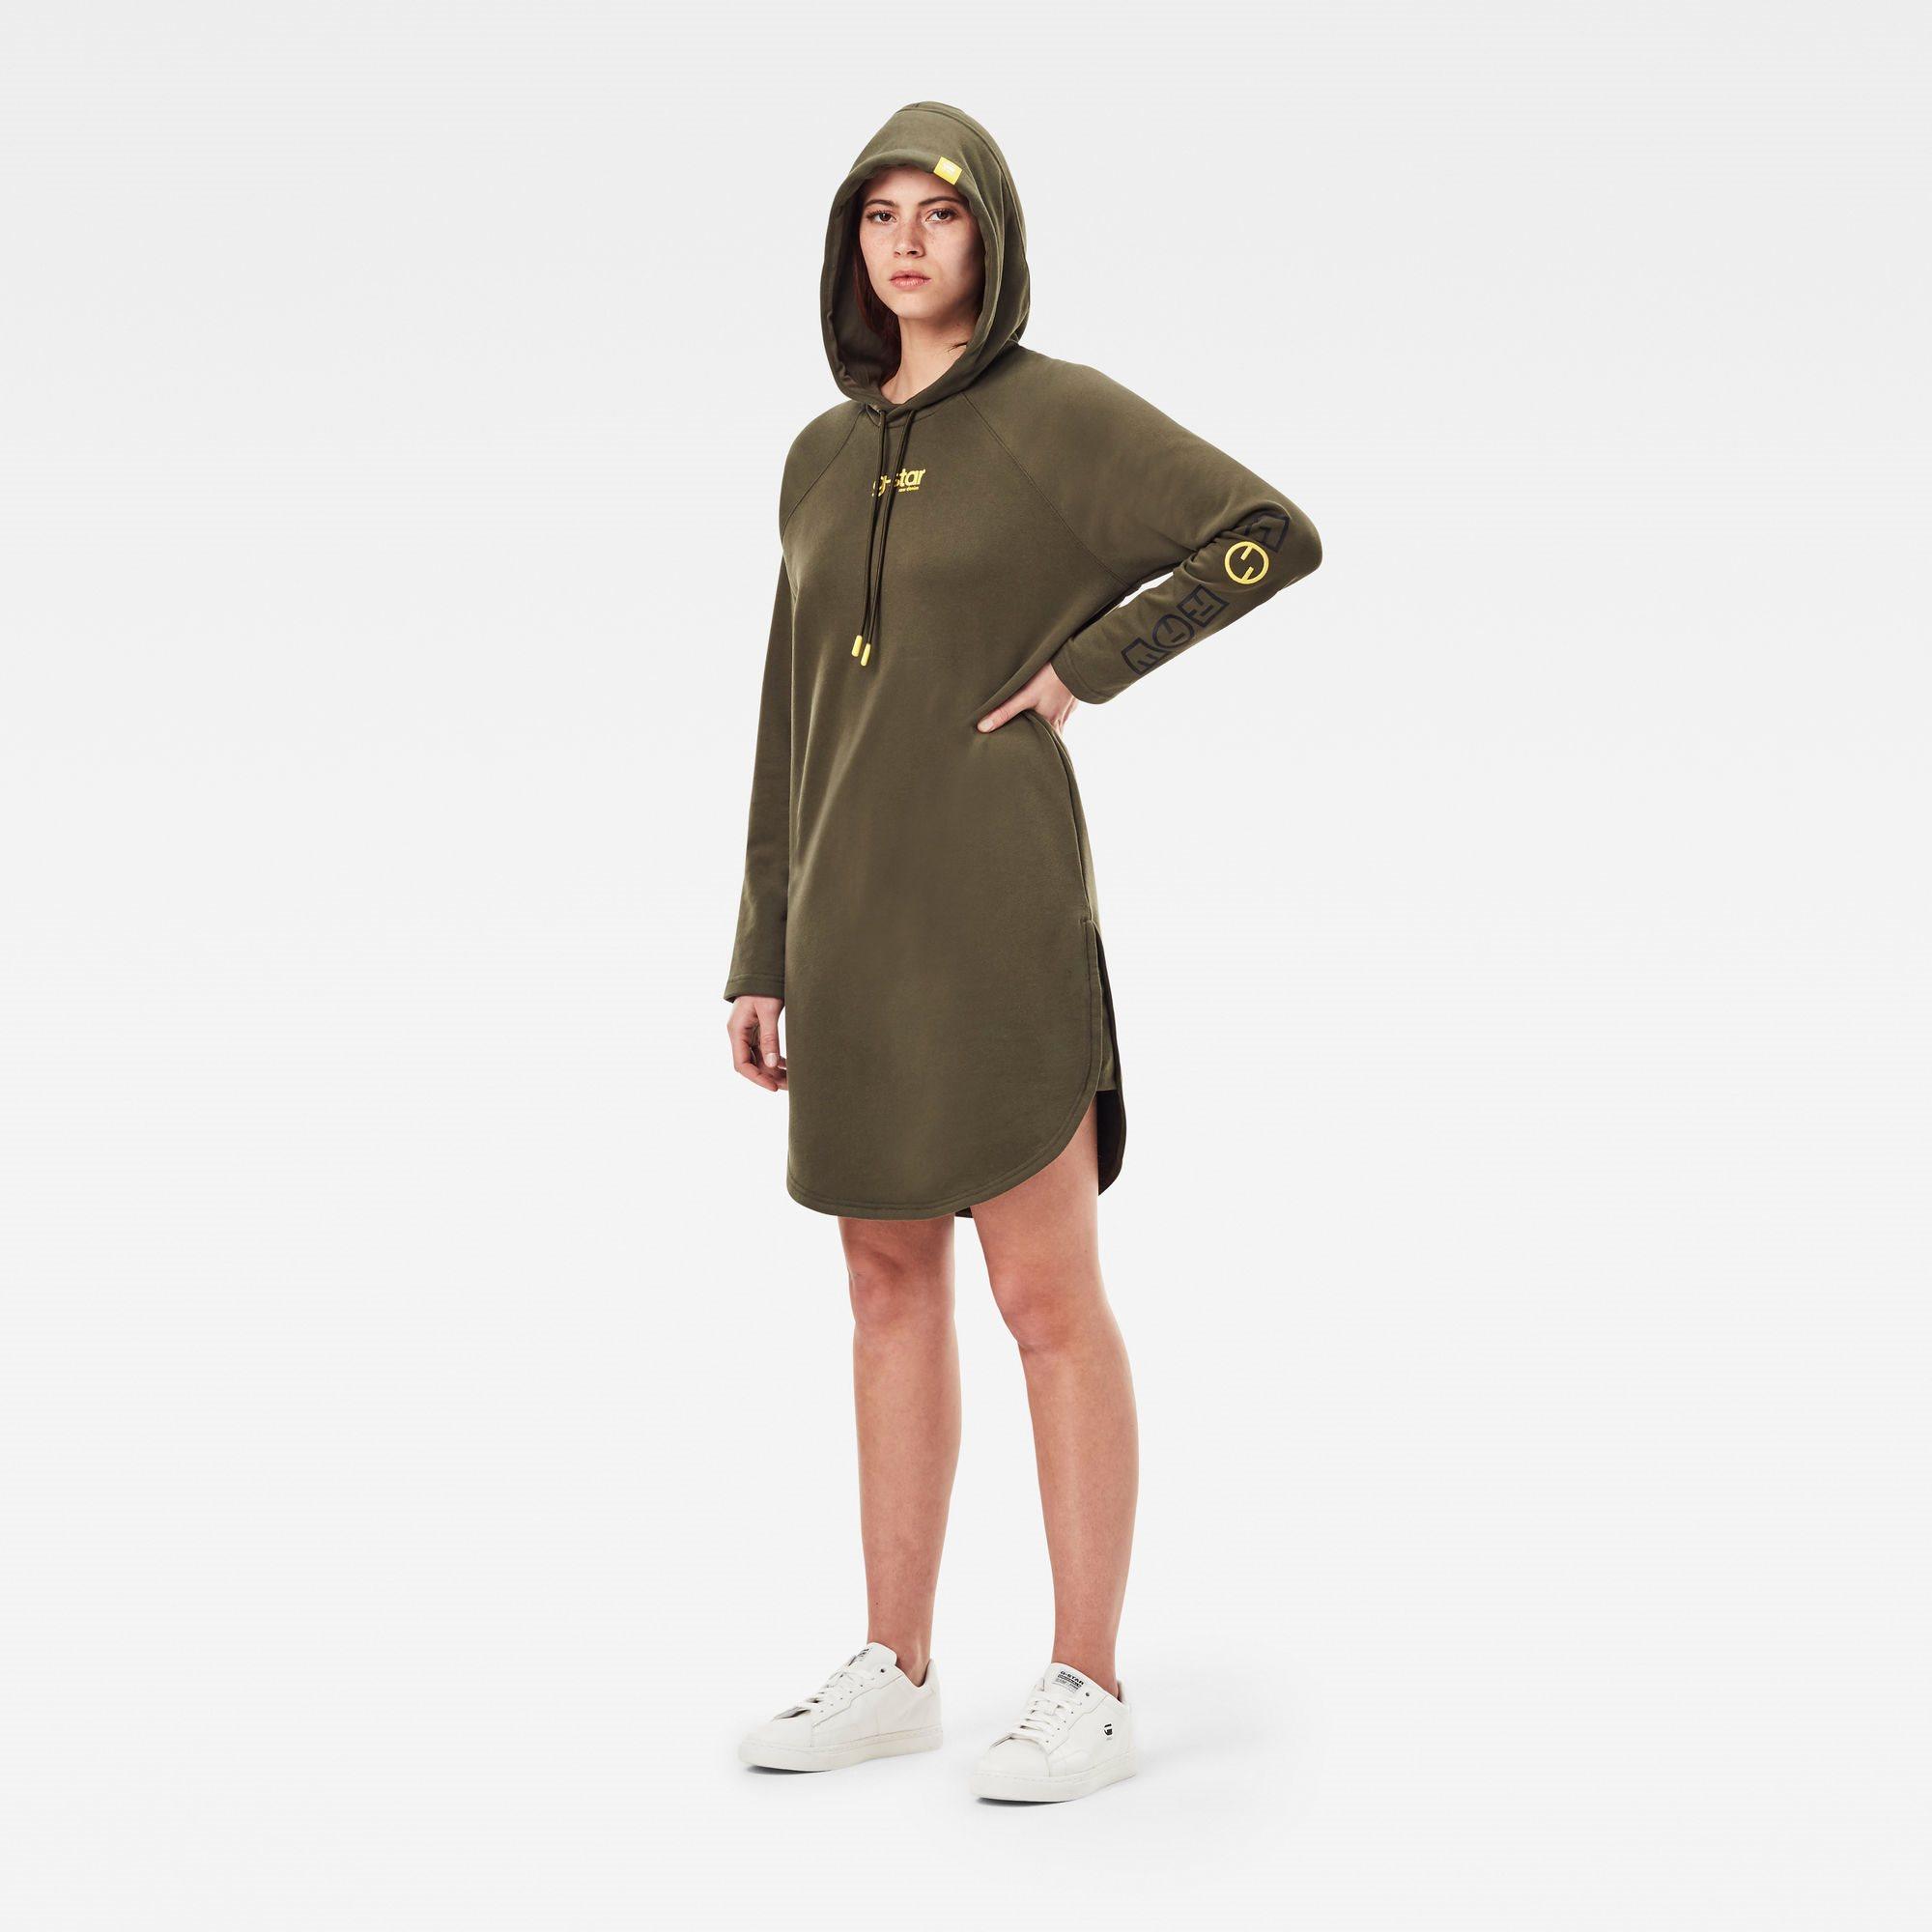 Sleeve print hooded sweat dres